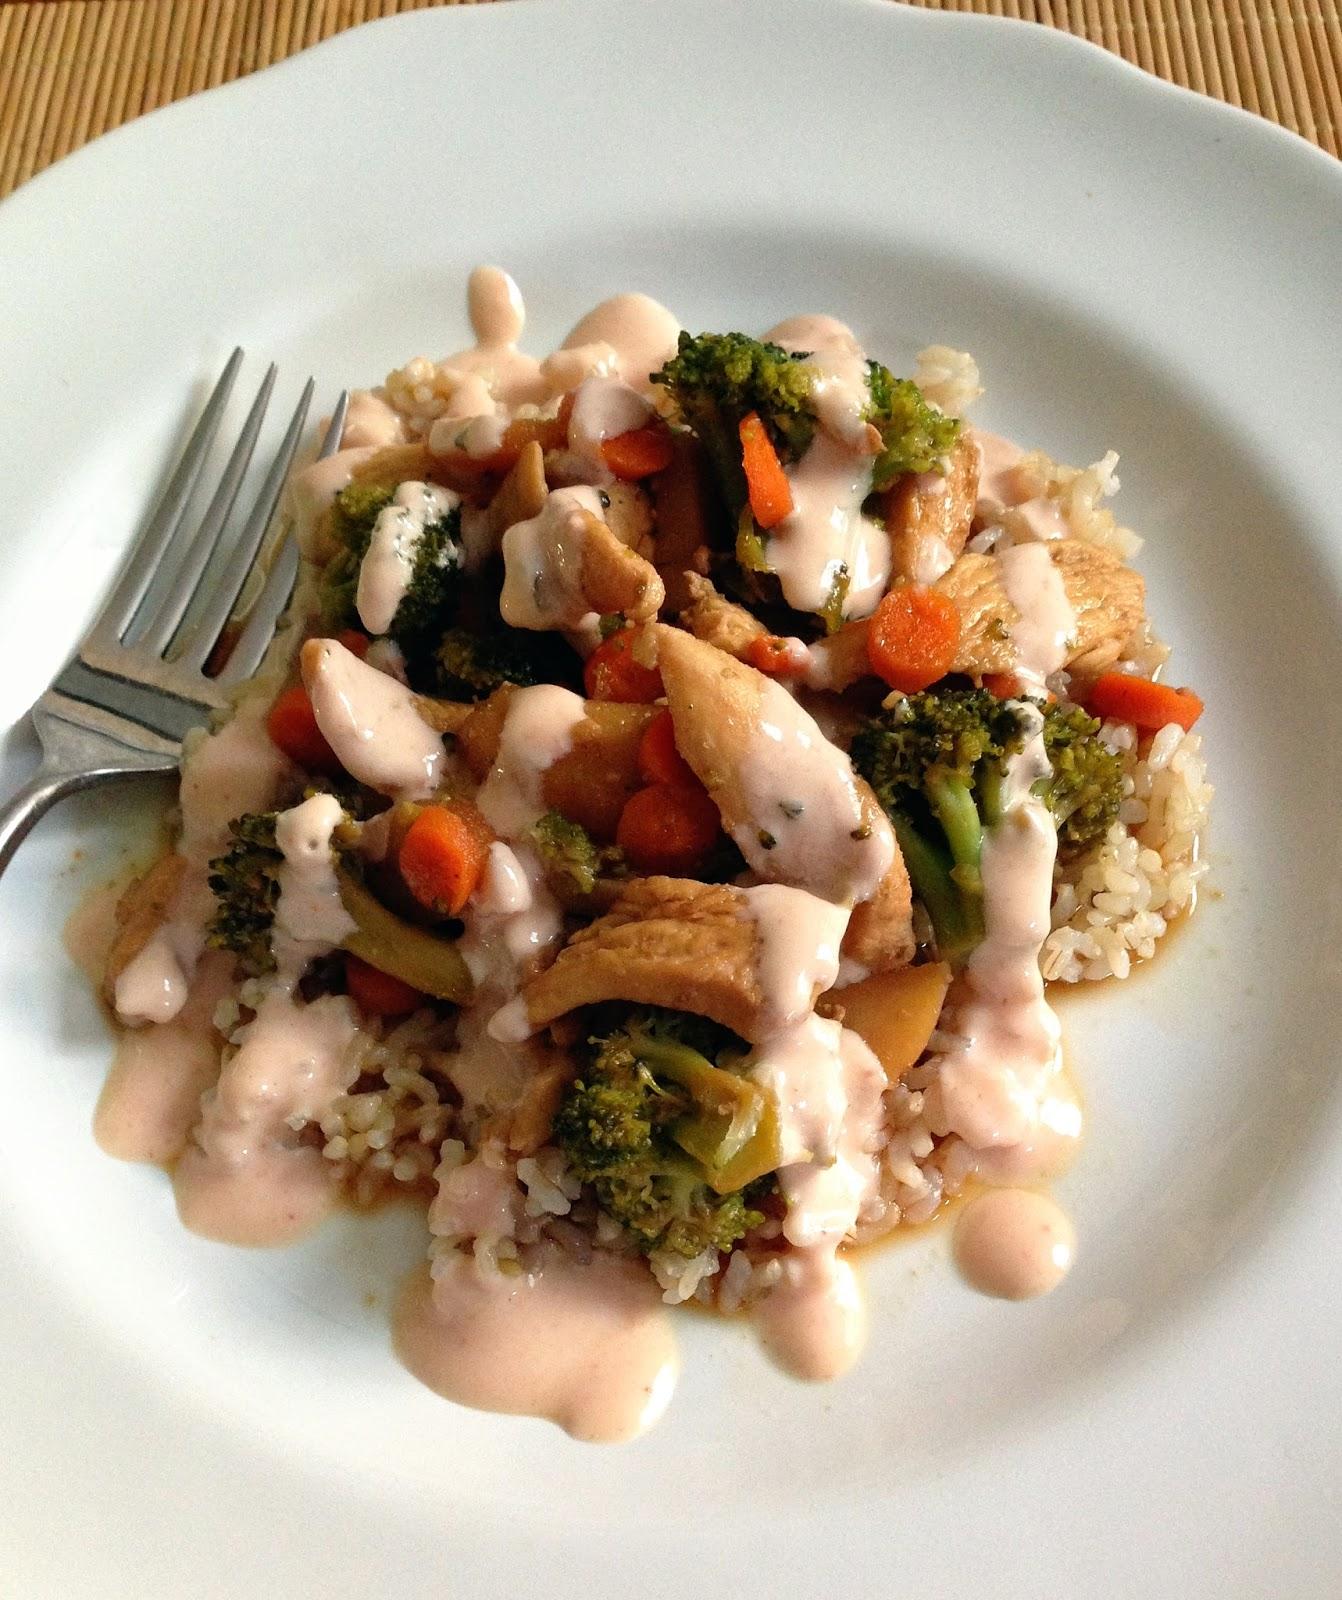 Taylor Made Healthy Chicken Teriyaki Stir Fry A Clean Version Of